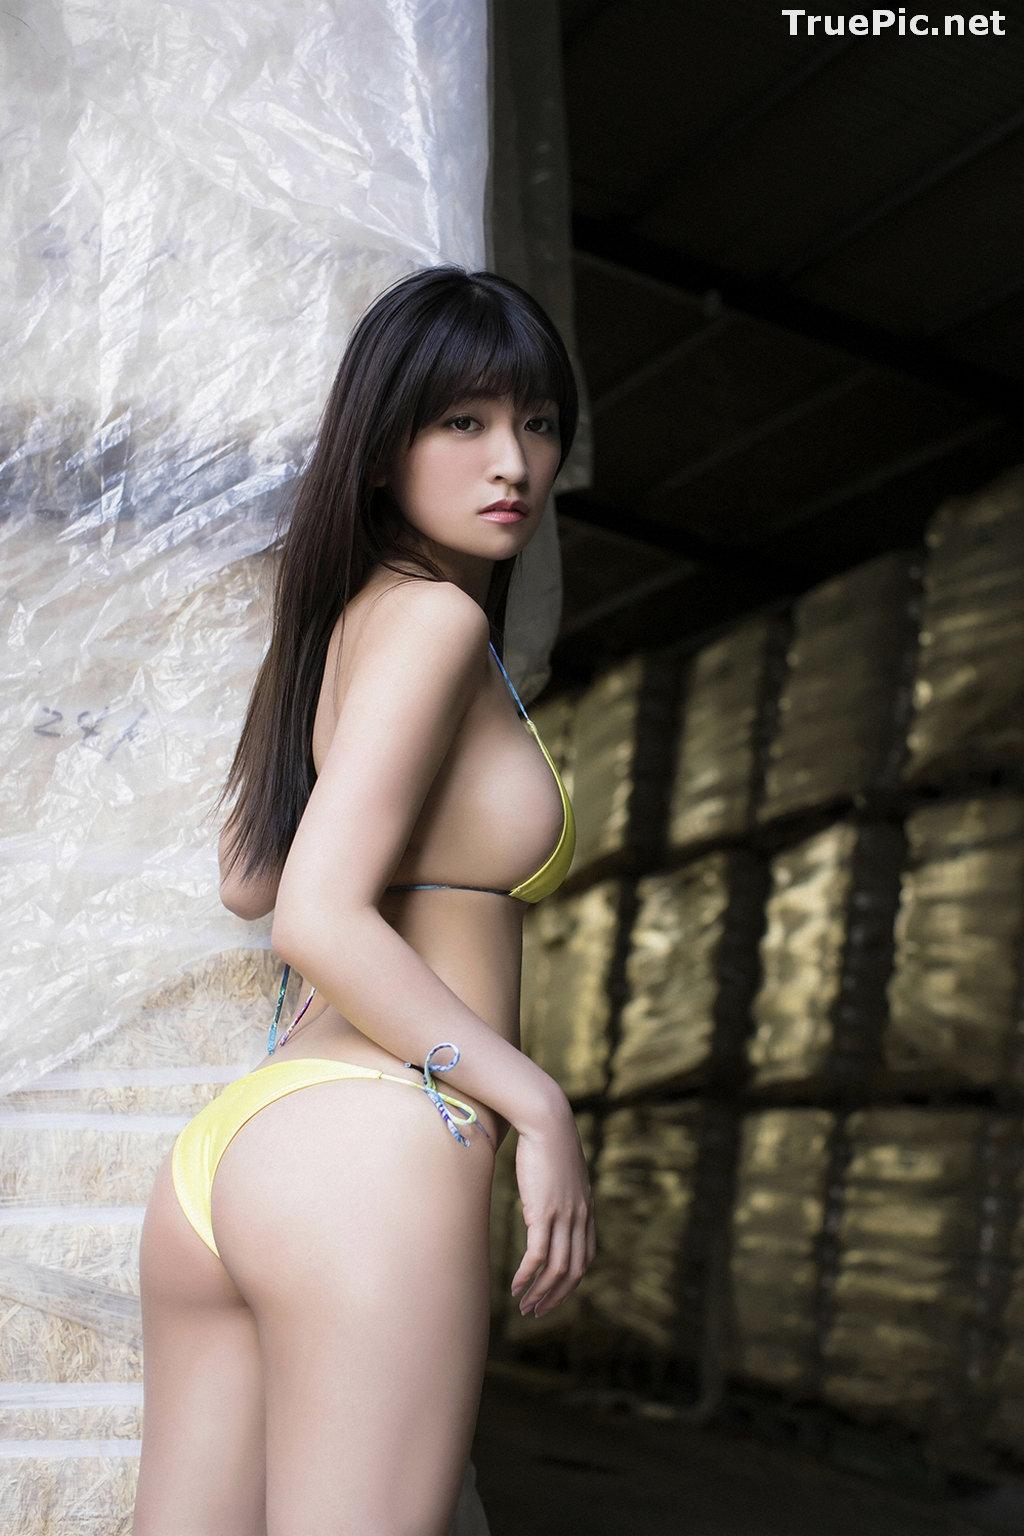 Image Japanese Idol Singer - Hoshino Manami - [YS-Web] Vol.834 - TruePic.net - Picture-9